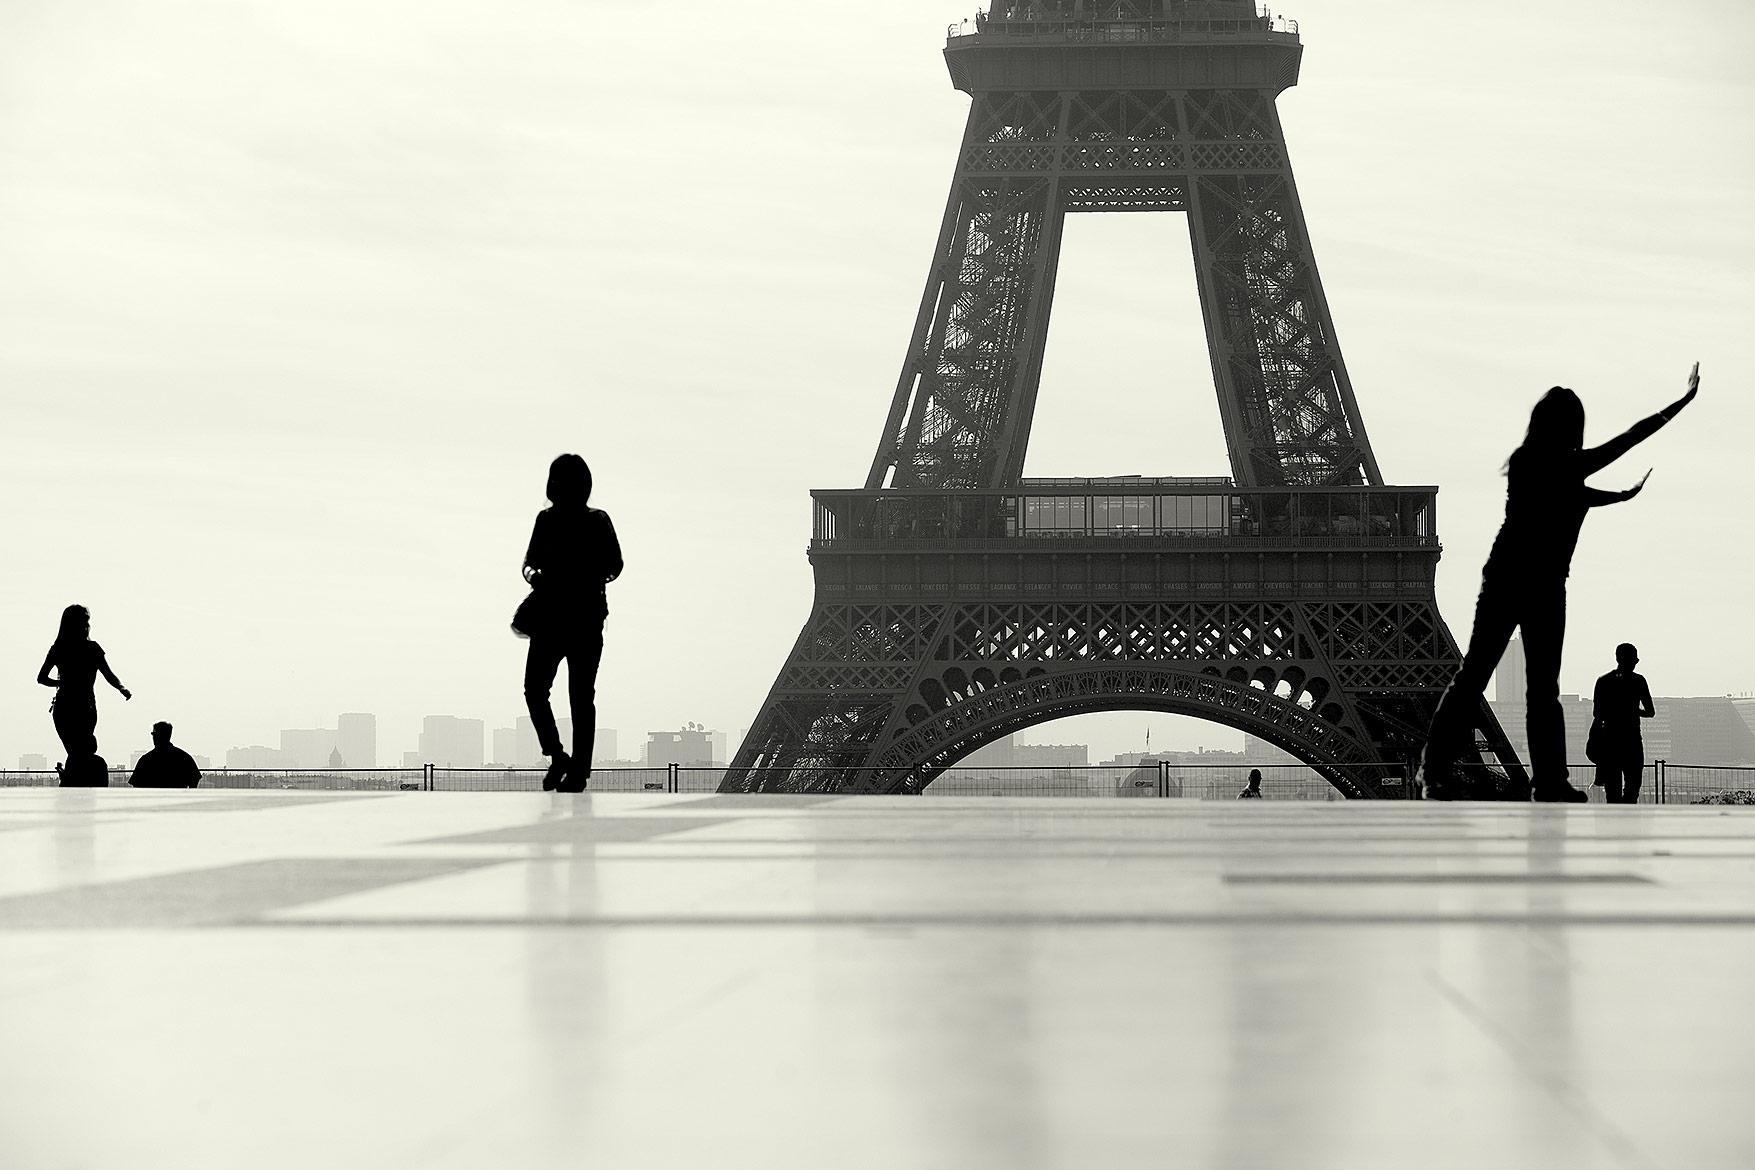 Easton_Paris_03.jpg